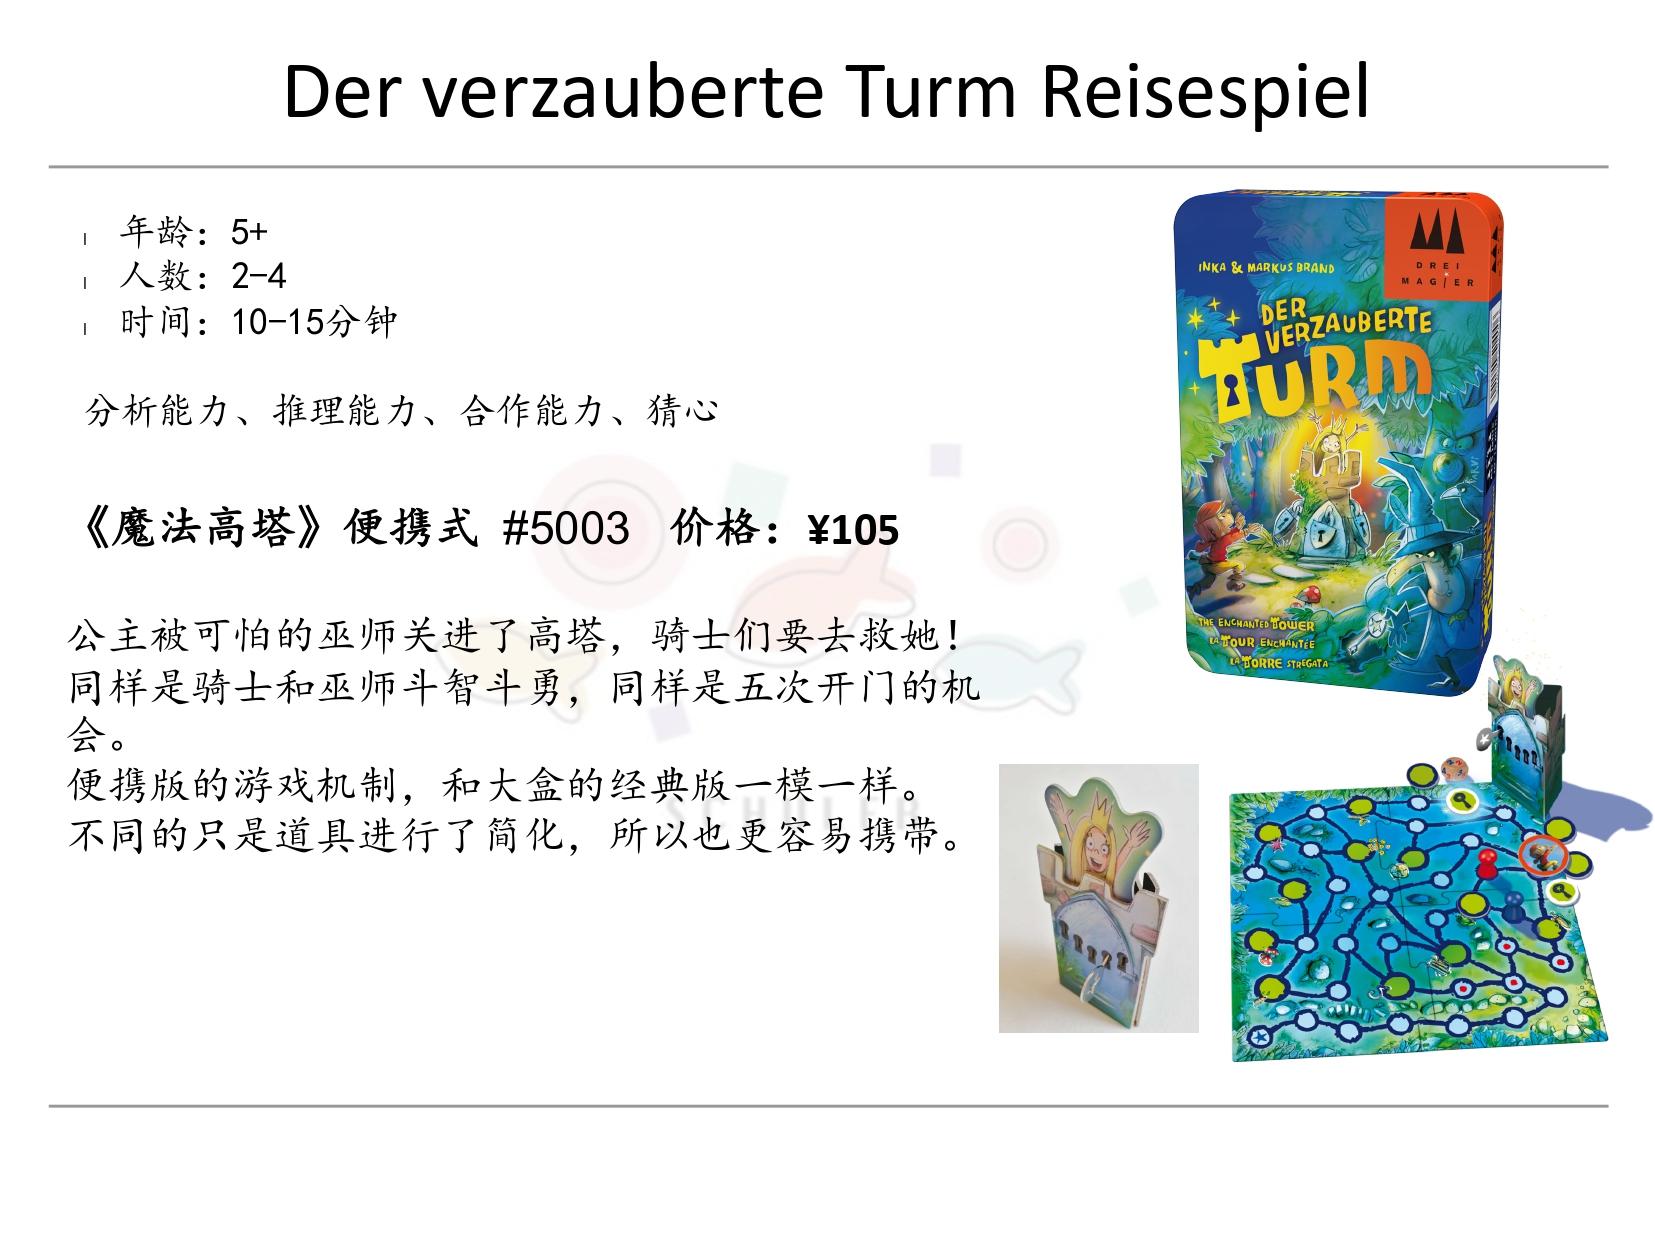 Der verzauberte Turm Reisespiel 魔法高塔便携版